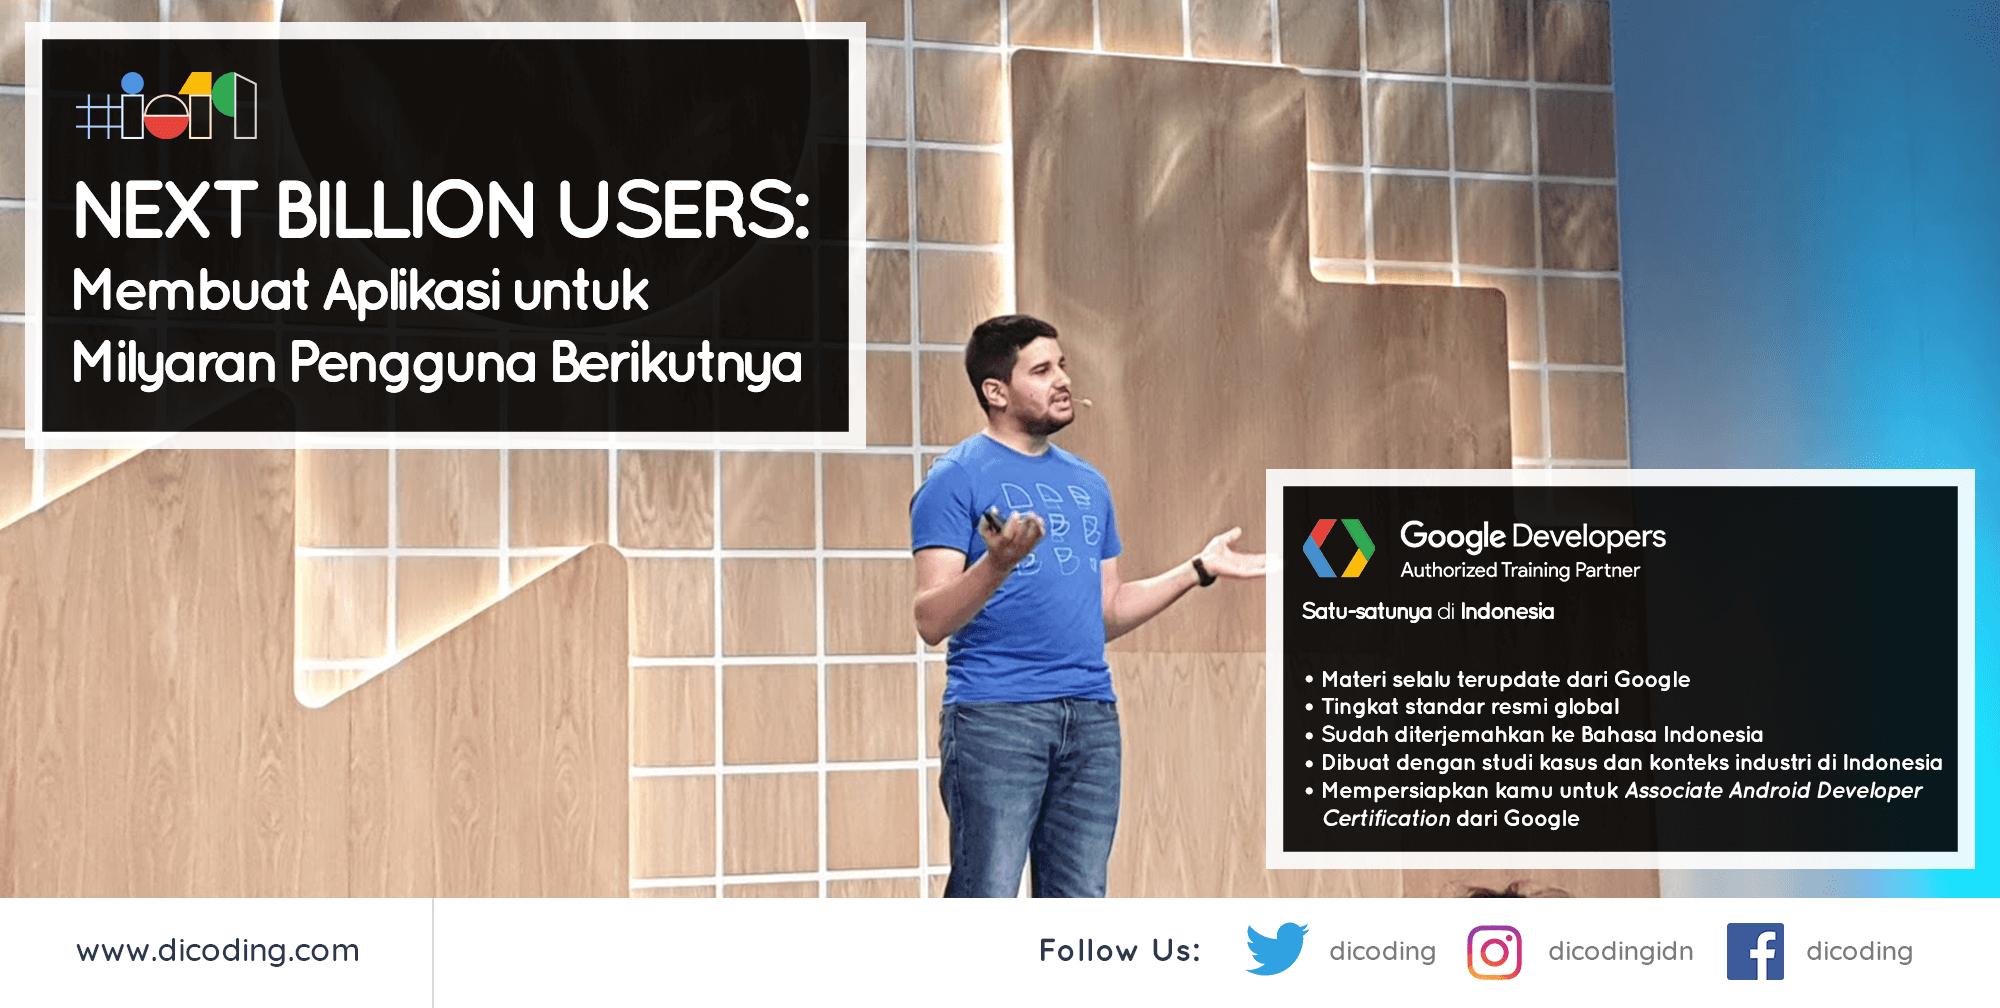 Membuat Aplikasi untuk Next Billion Users